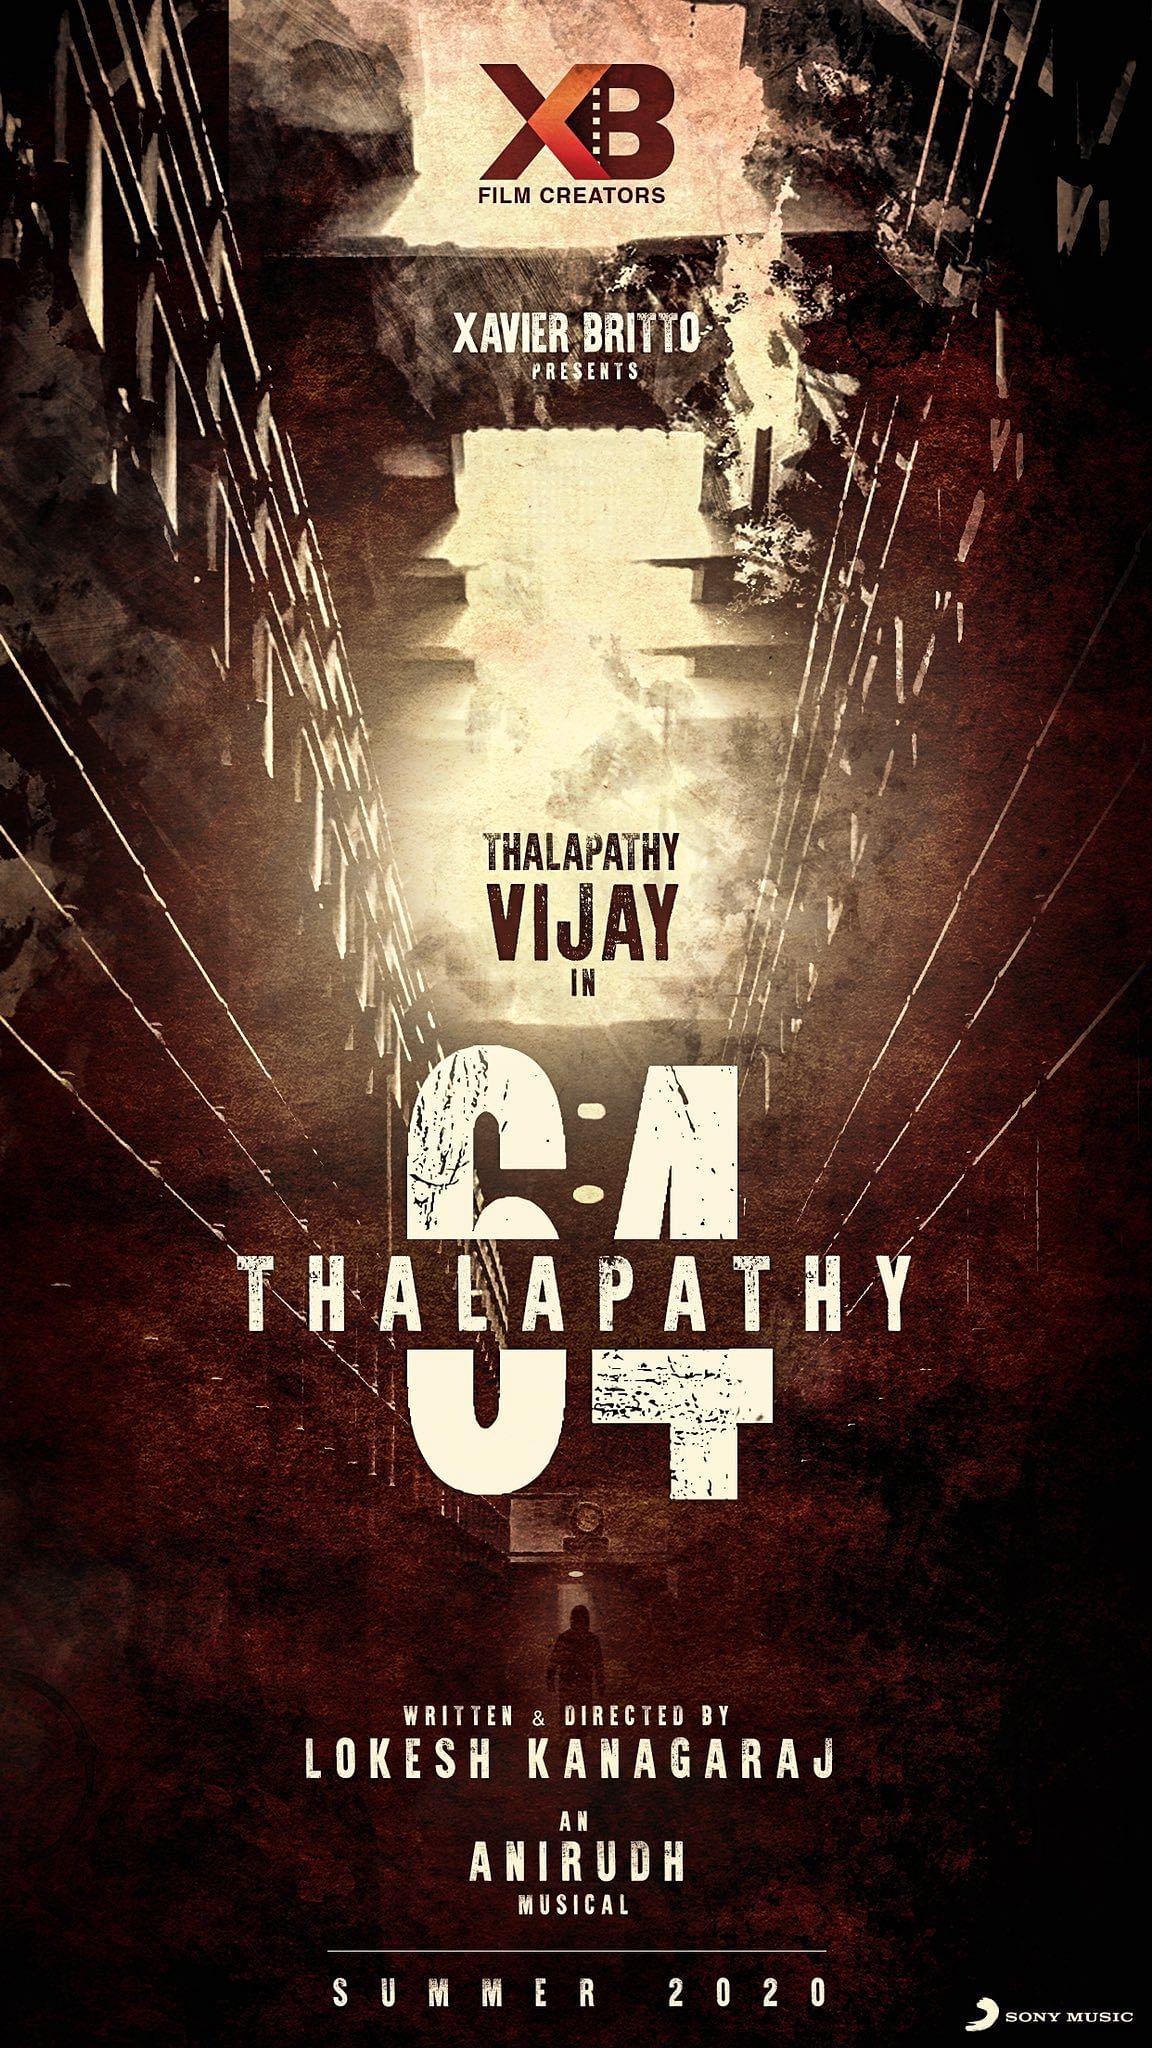 Vijay 64 announcement